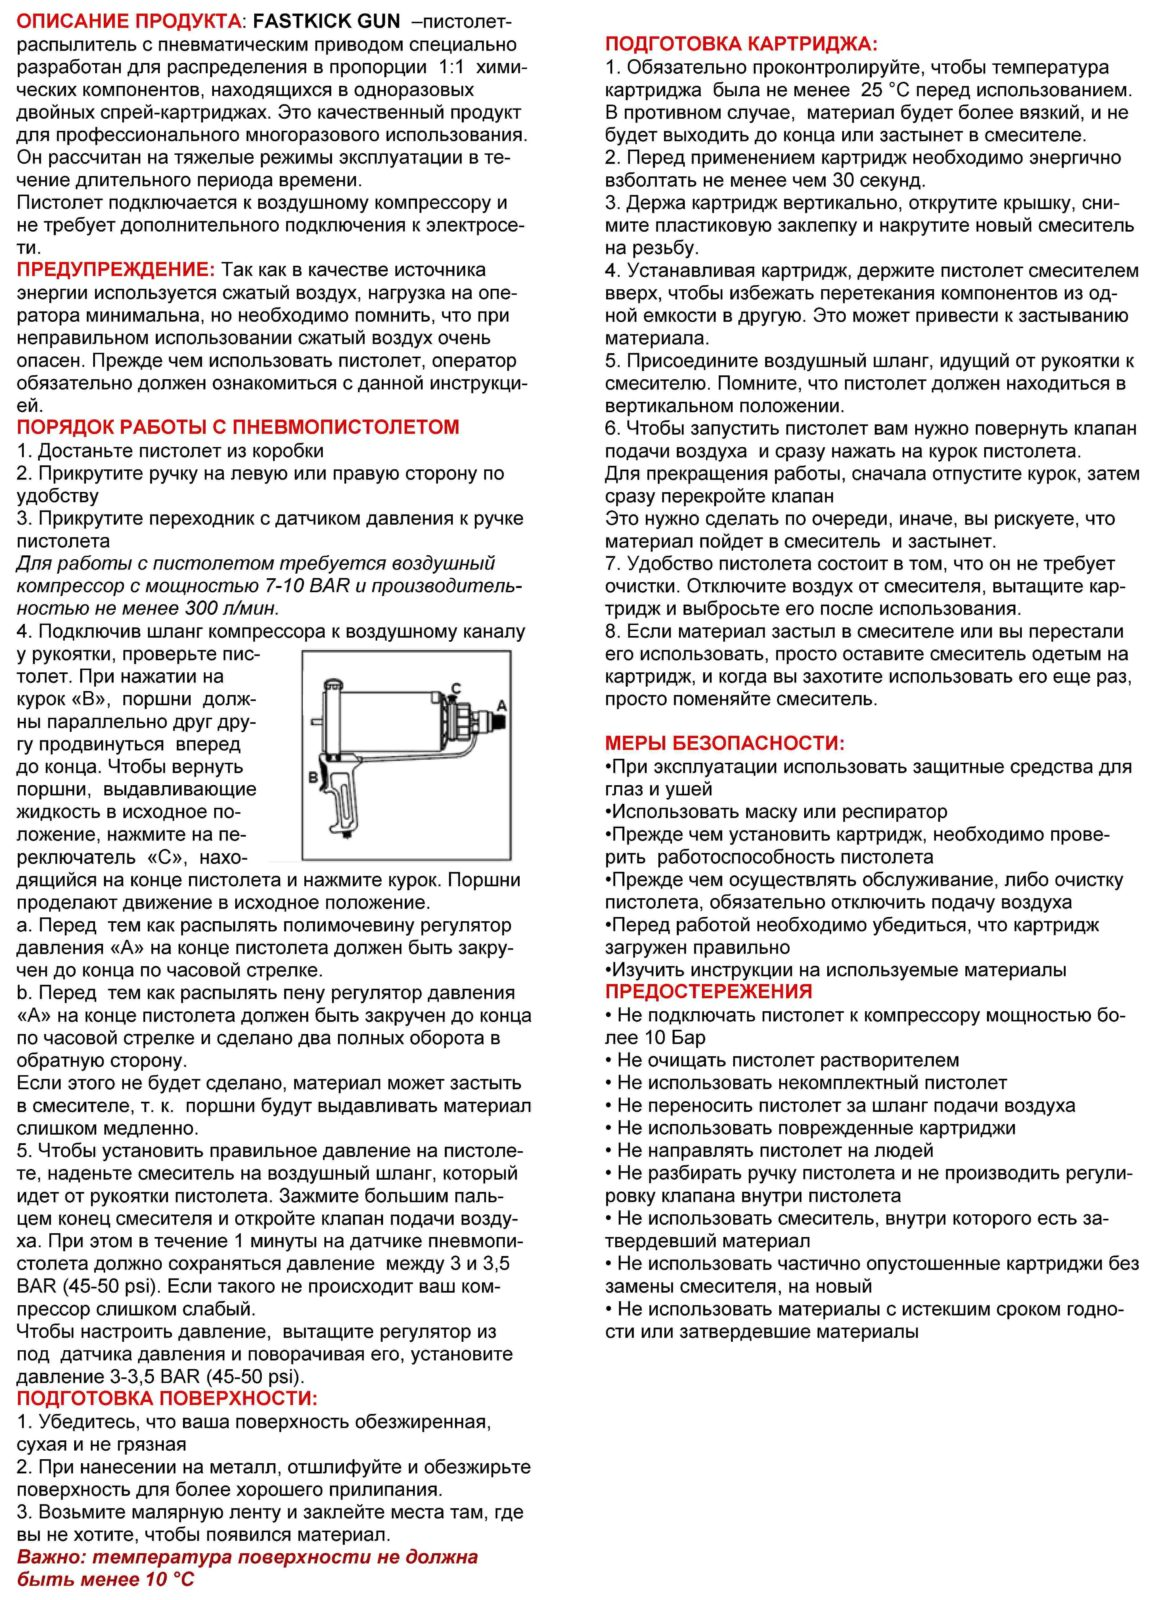 Soythane Technologies FastKick Gun инструкция по эксплуатации